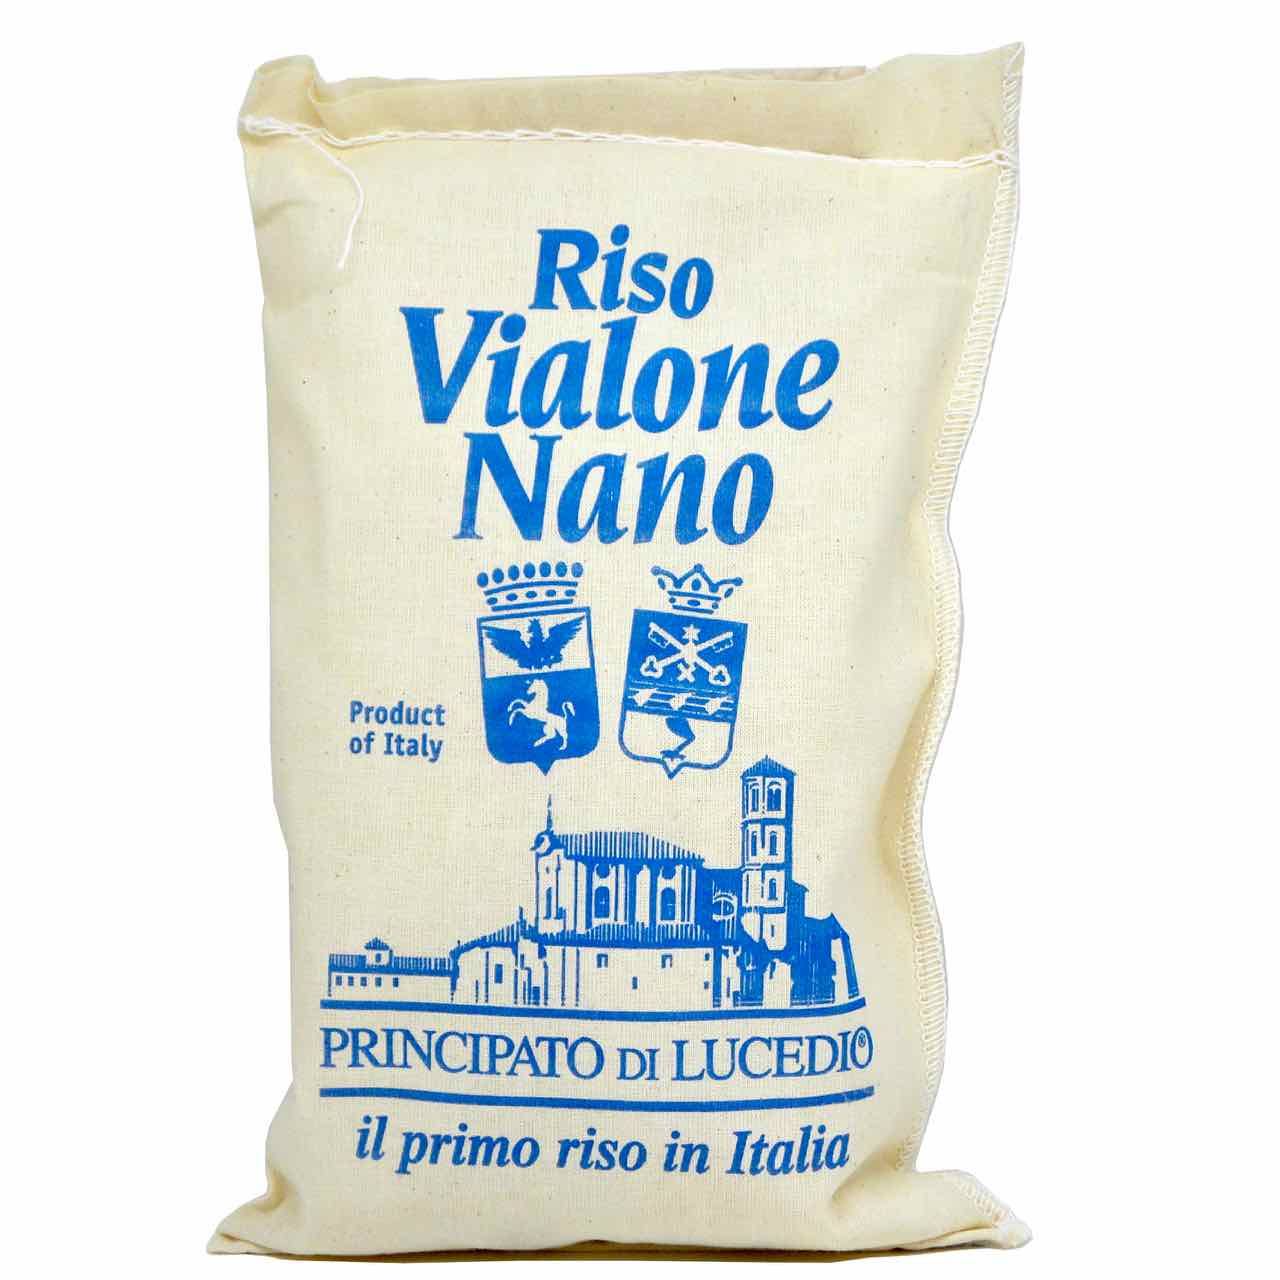 Vialone Nano rice – Principato di Lucedio –  best Italian food – Gustorotondo online food shop – authentic Italian artisan food online